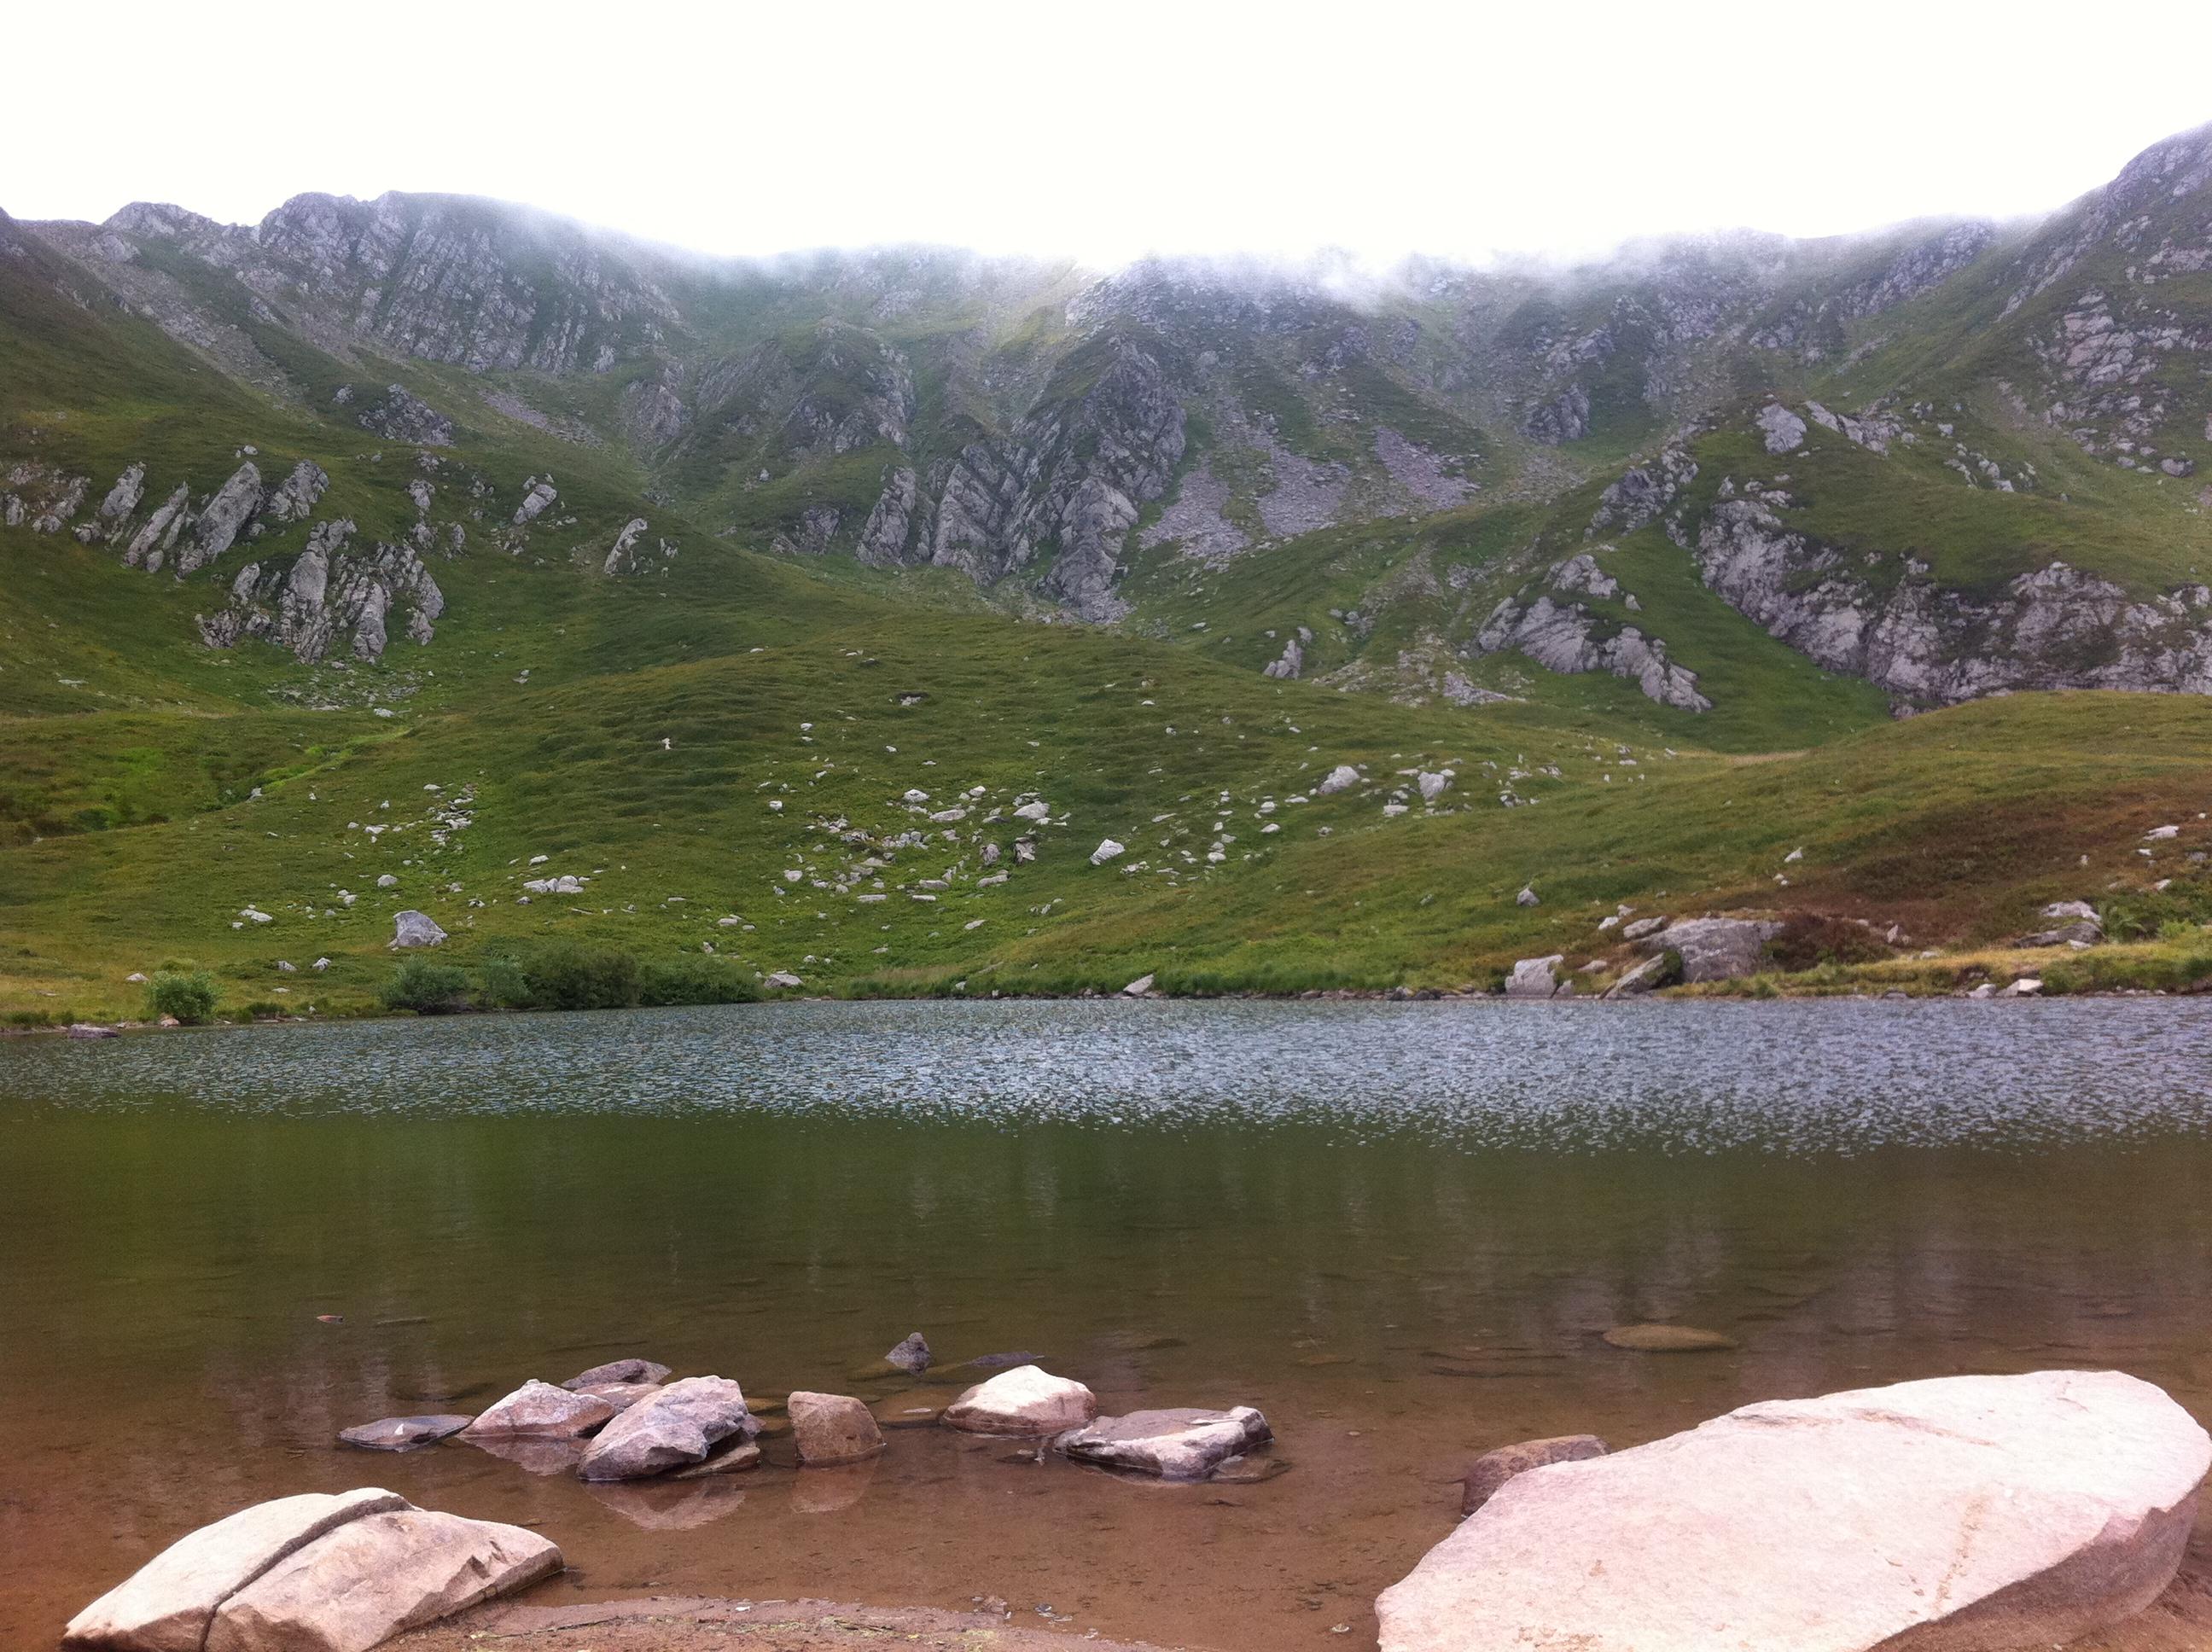 Lago bargetana ESCAPE='HTML'